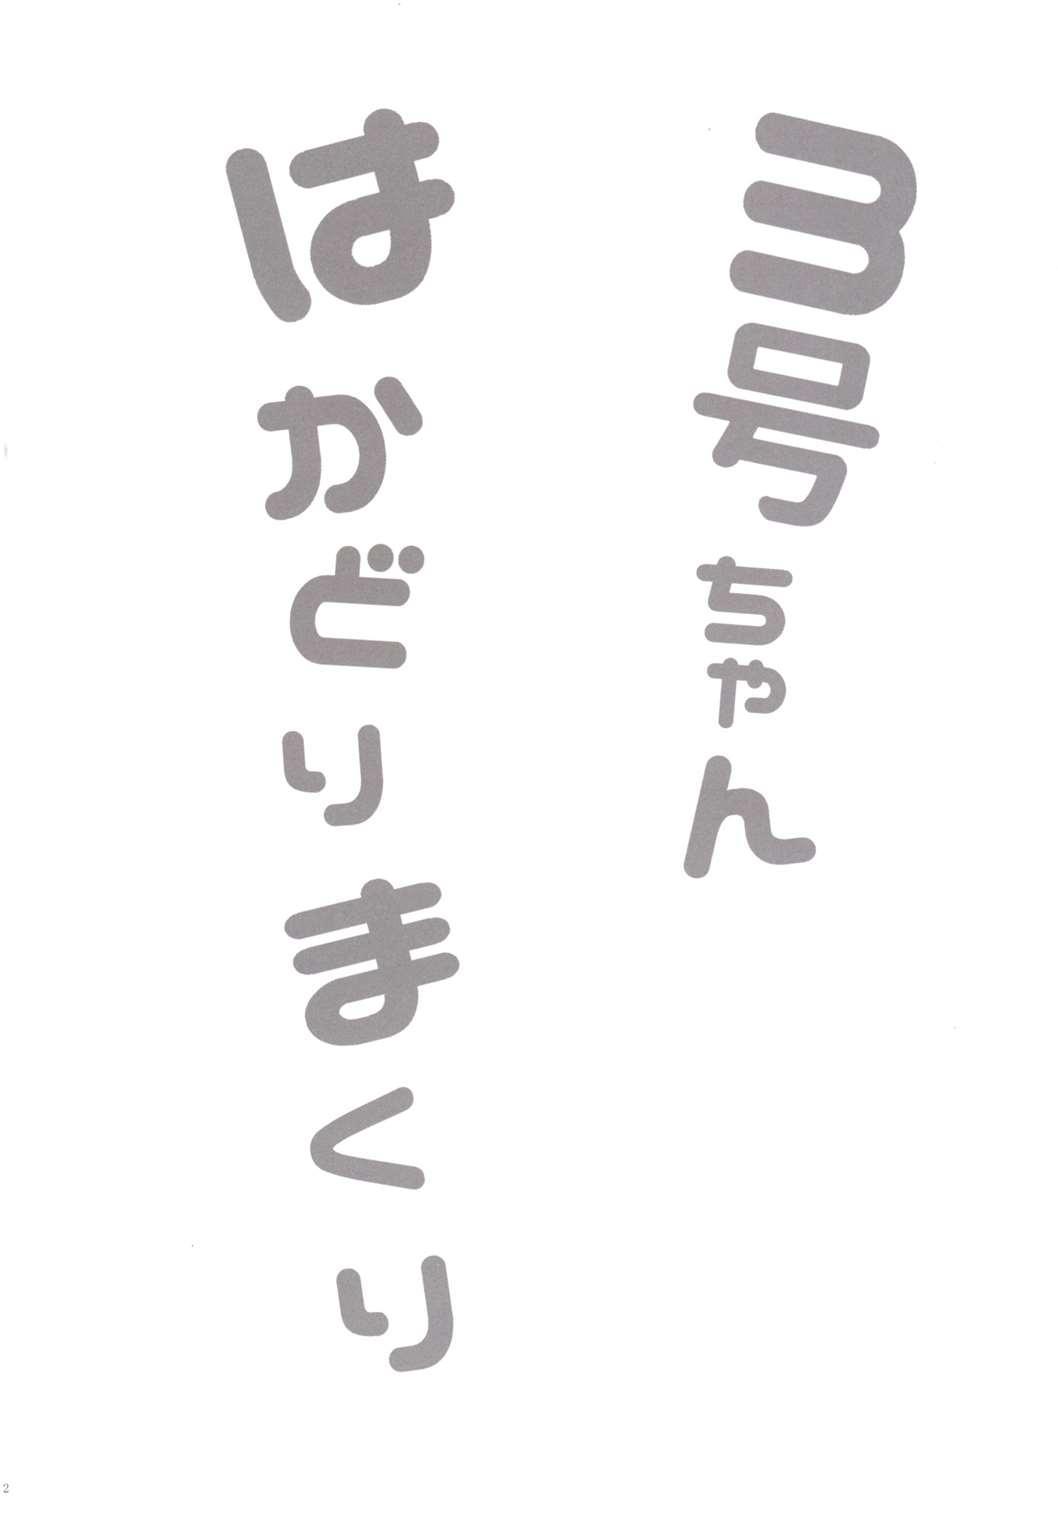 (C90) [Fullswing Otome (Takayamanon)] 3-gou-chan Hakadorimakuri (Hacka Doll) 2